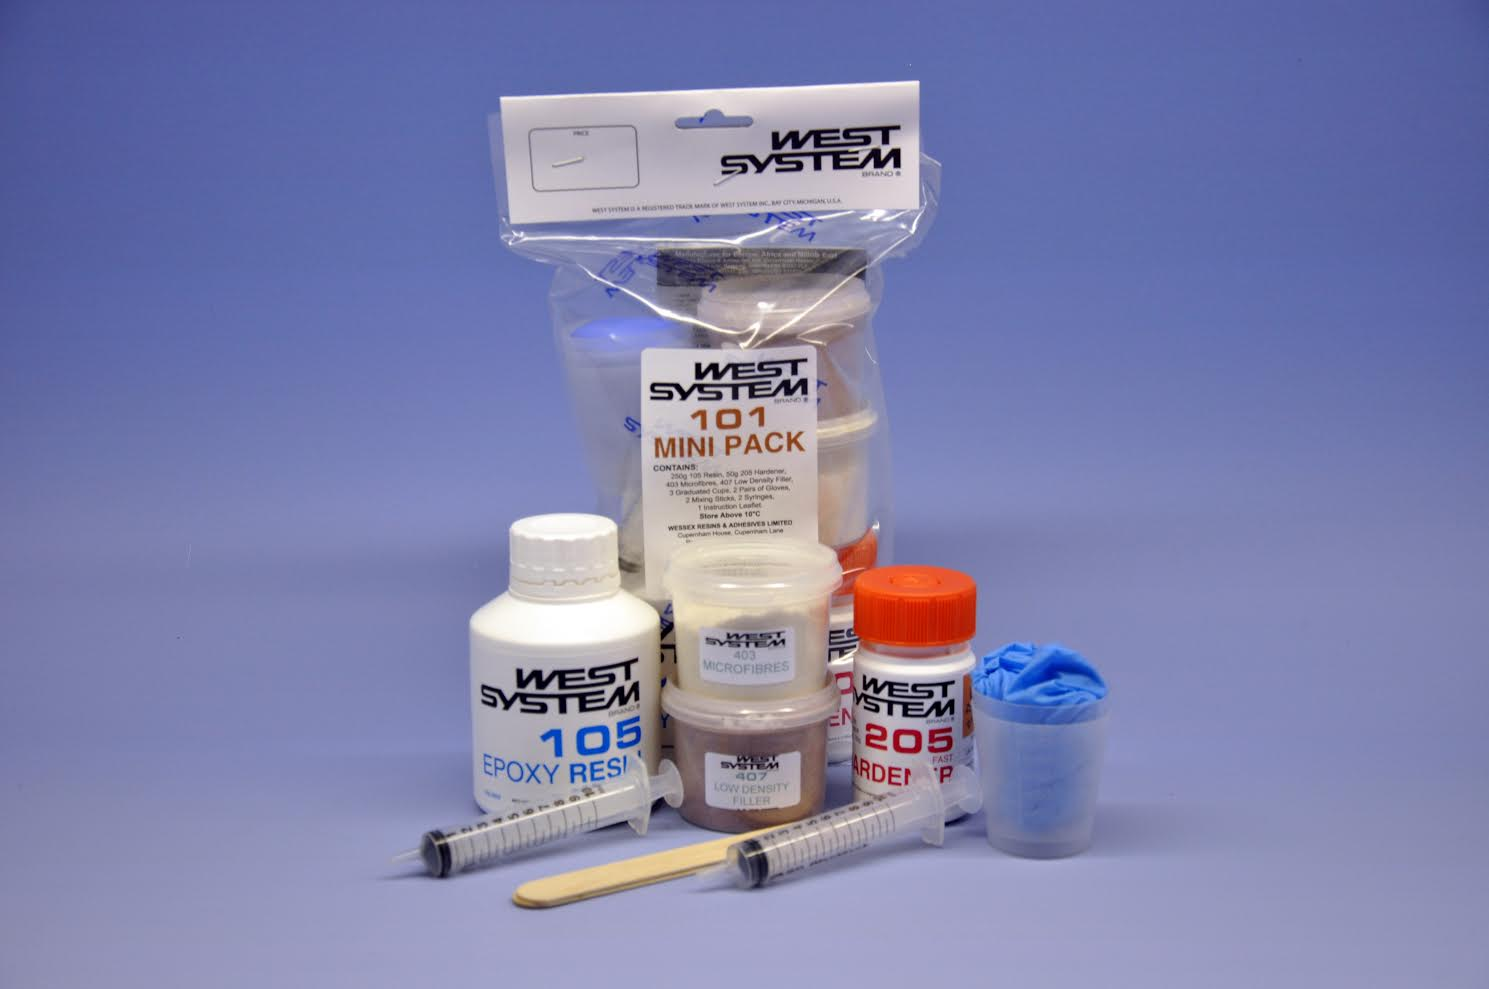 Dette 'Mini Repair Kit' kan bl.a. købes hos Watski fra 249,00 kr. Foto: PR-foto